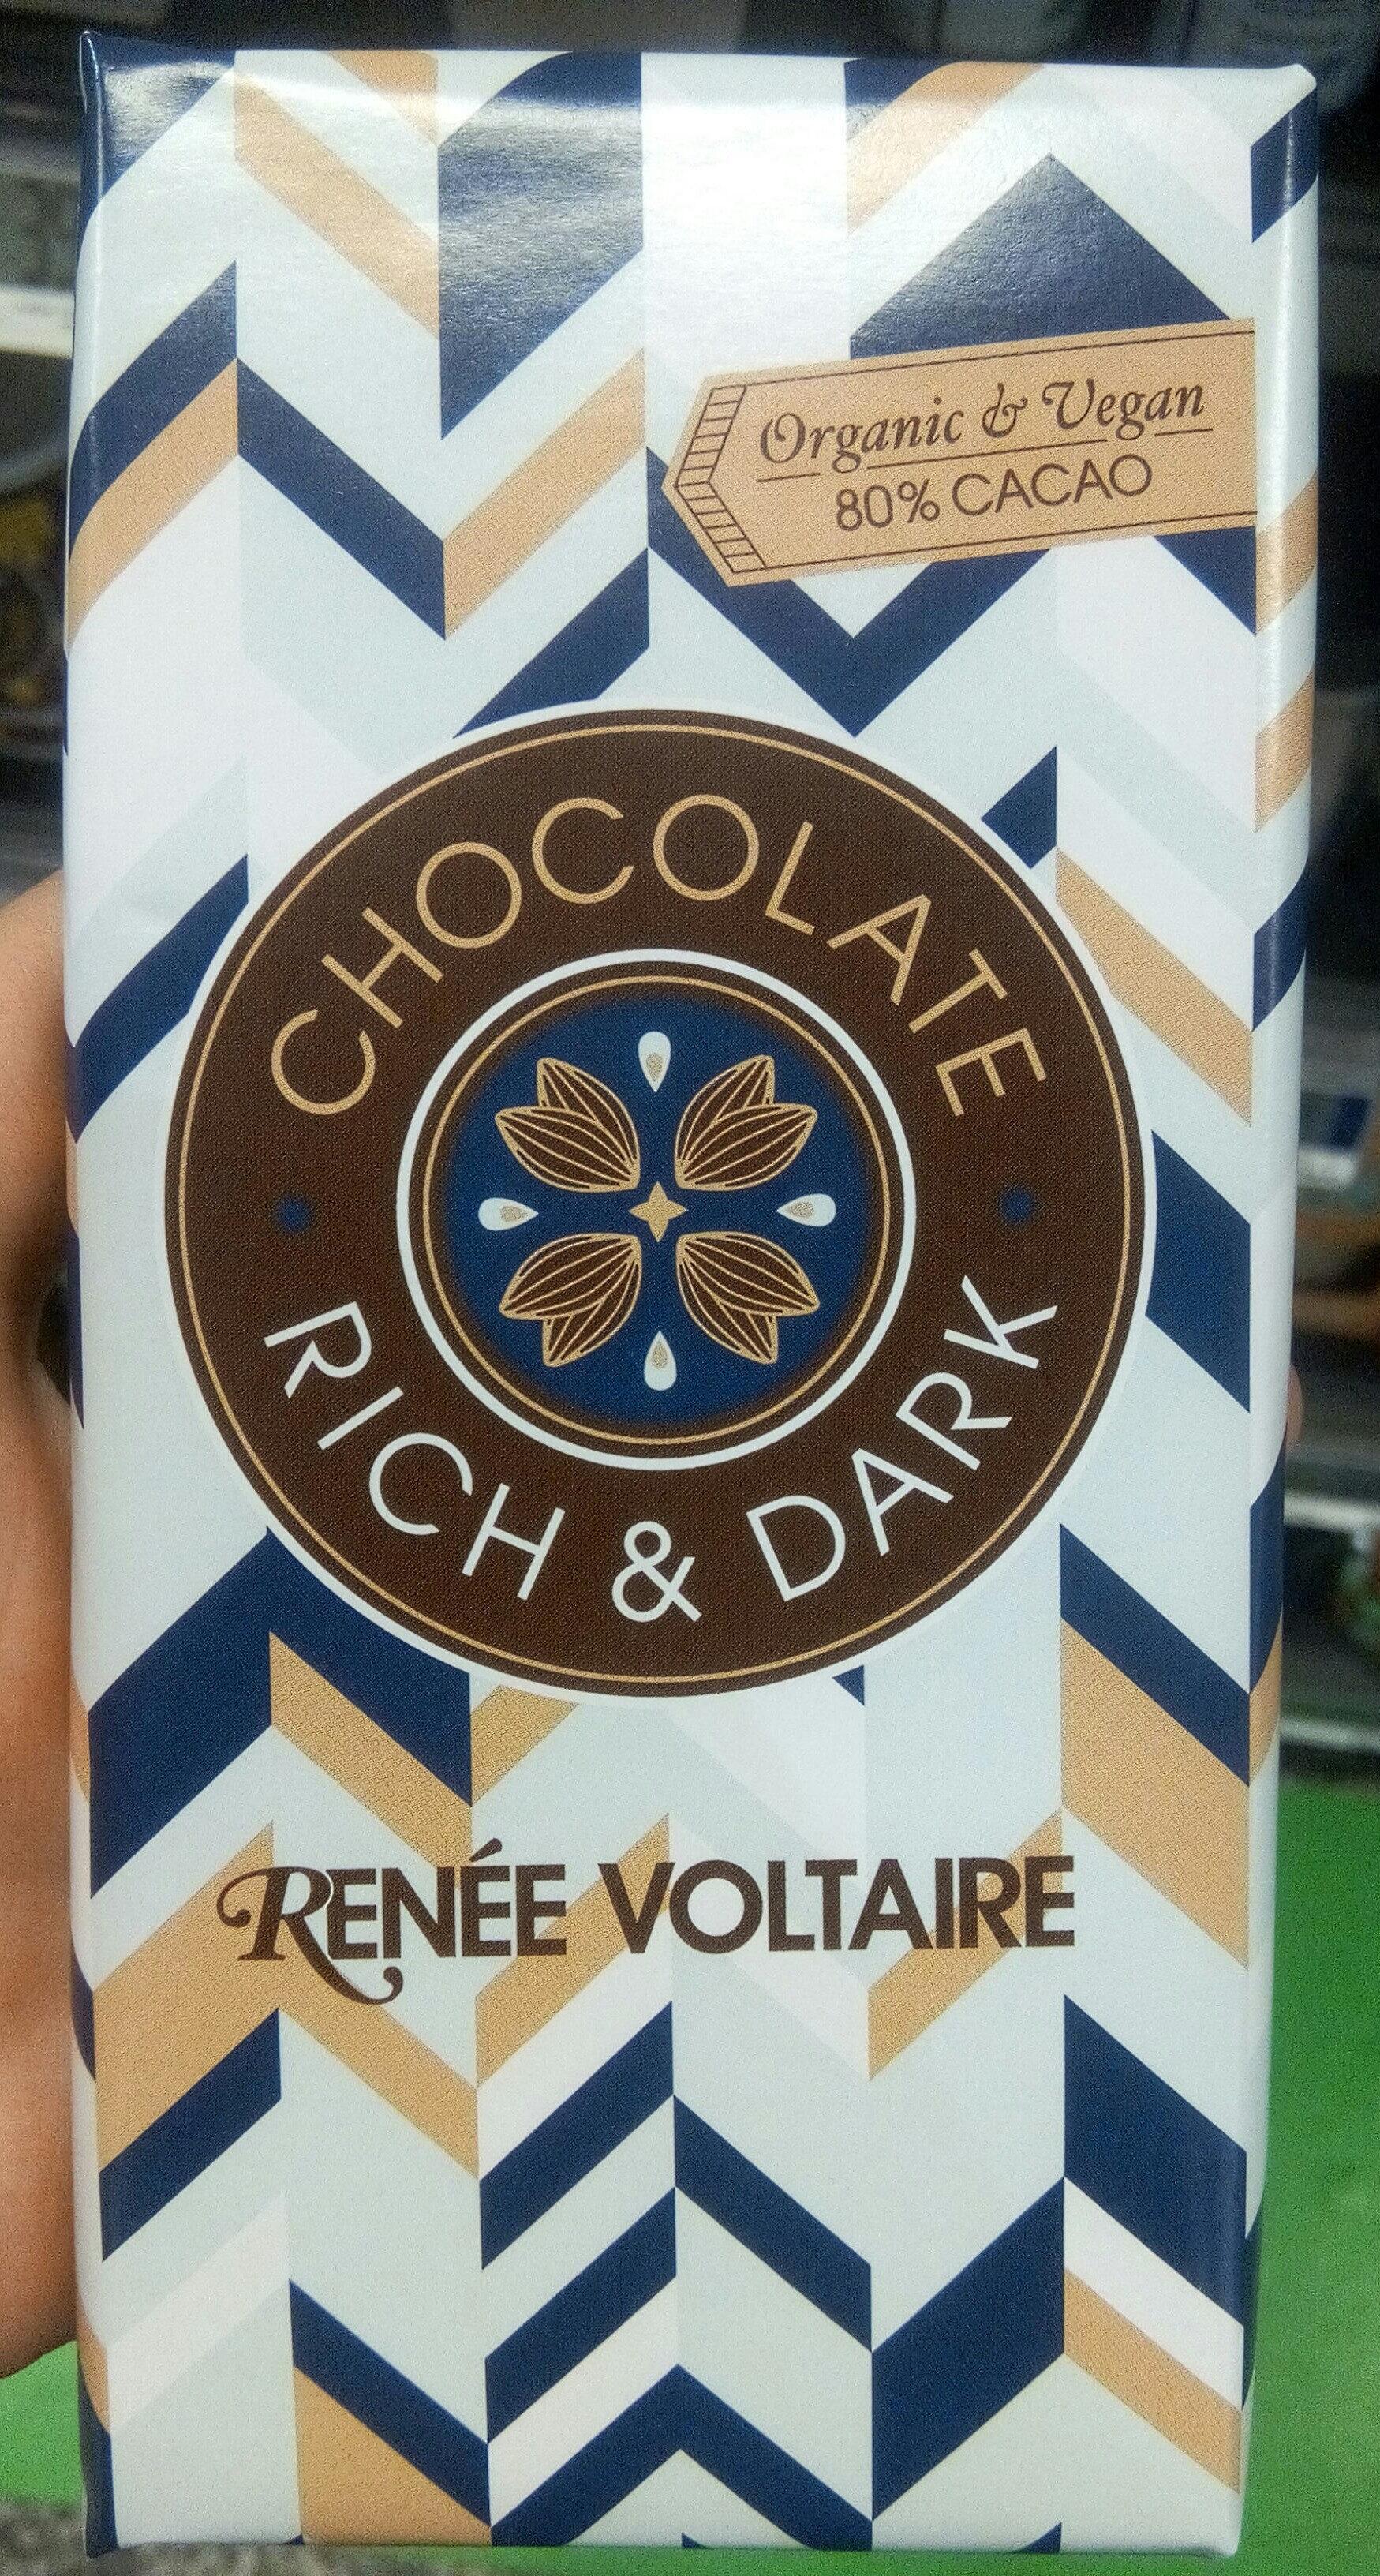 Chocolate rich & dark 80% - Product